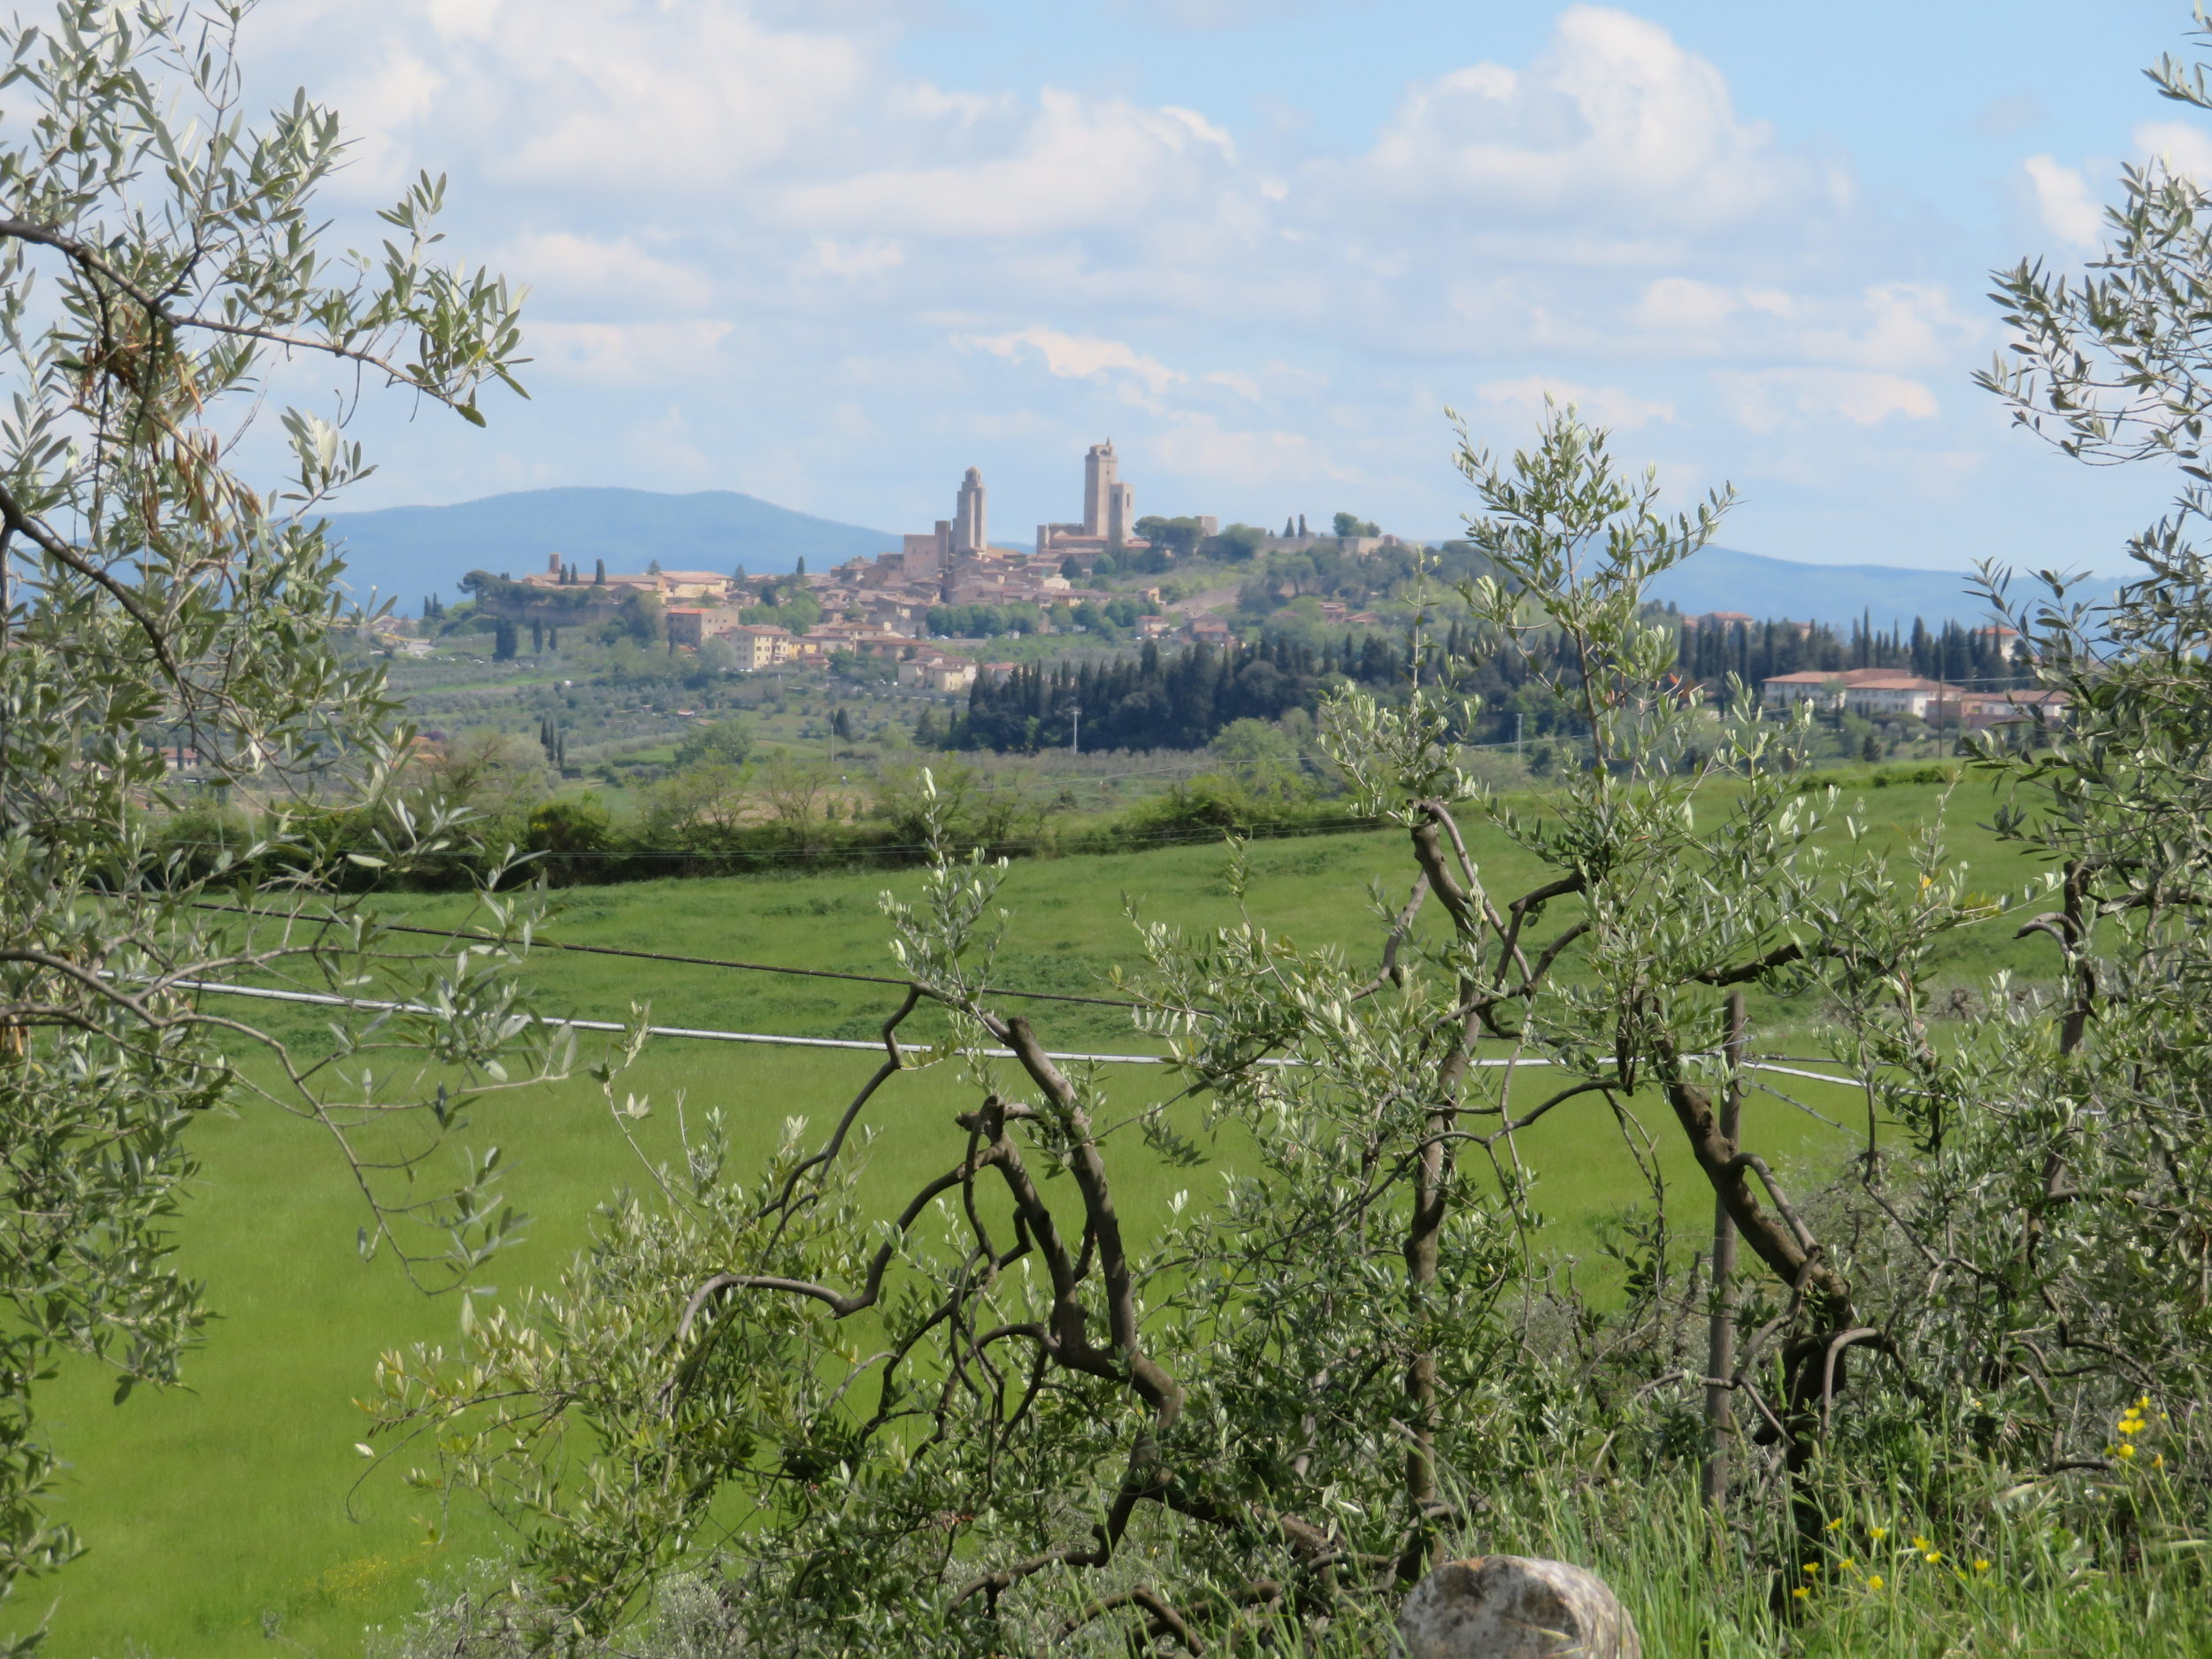 It's not OZ, it's San Gimignano.